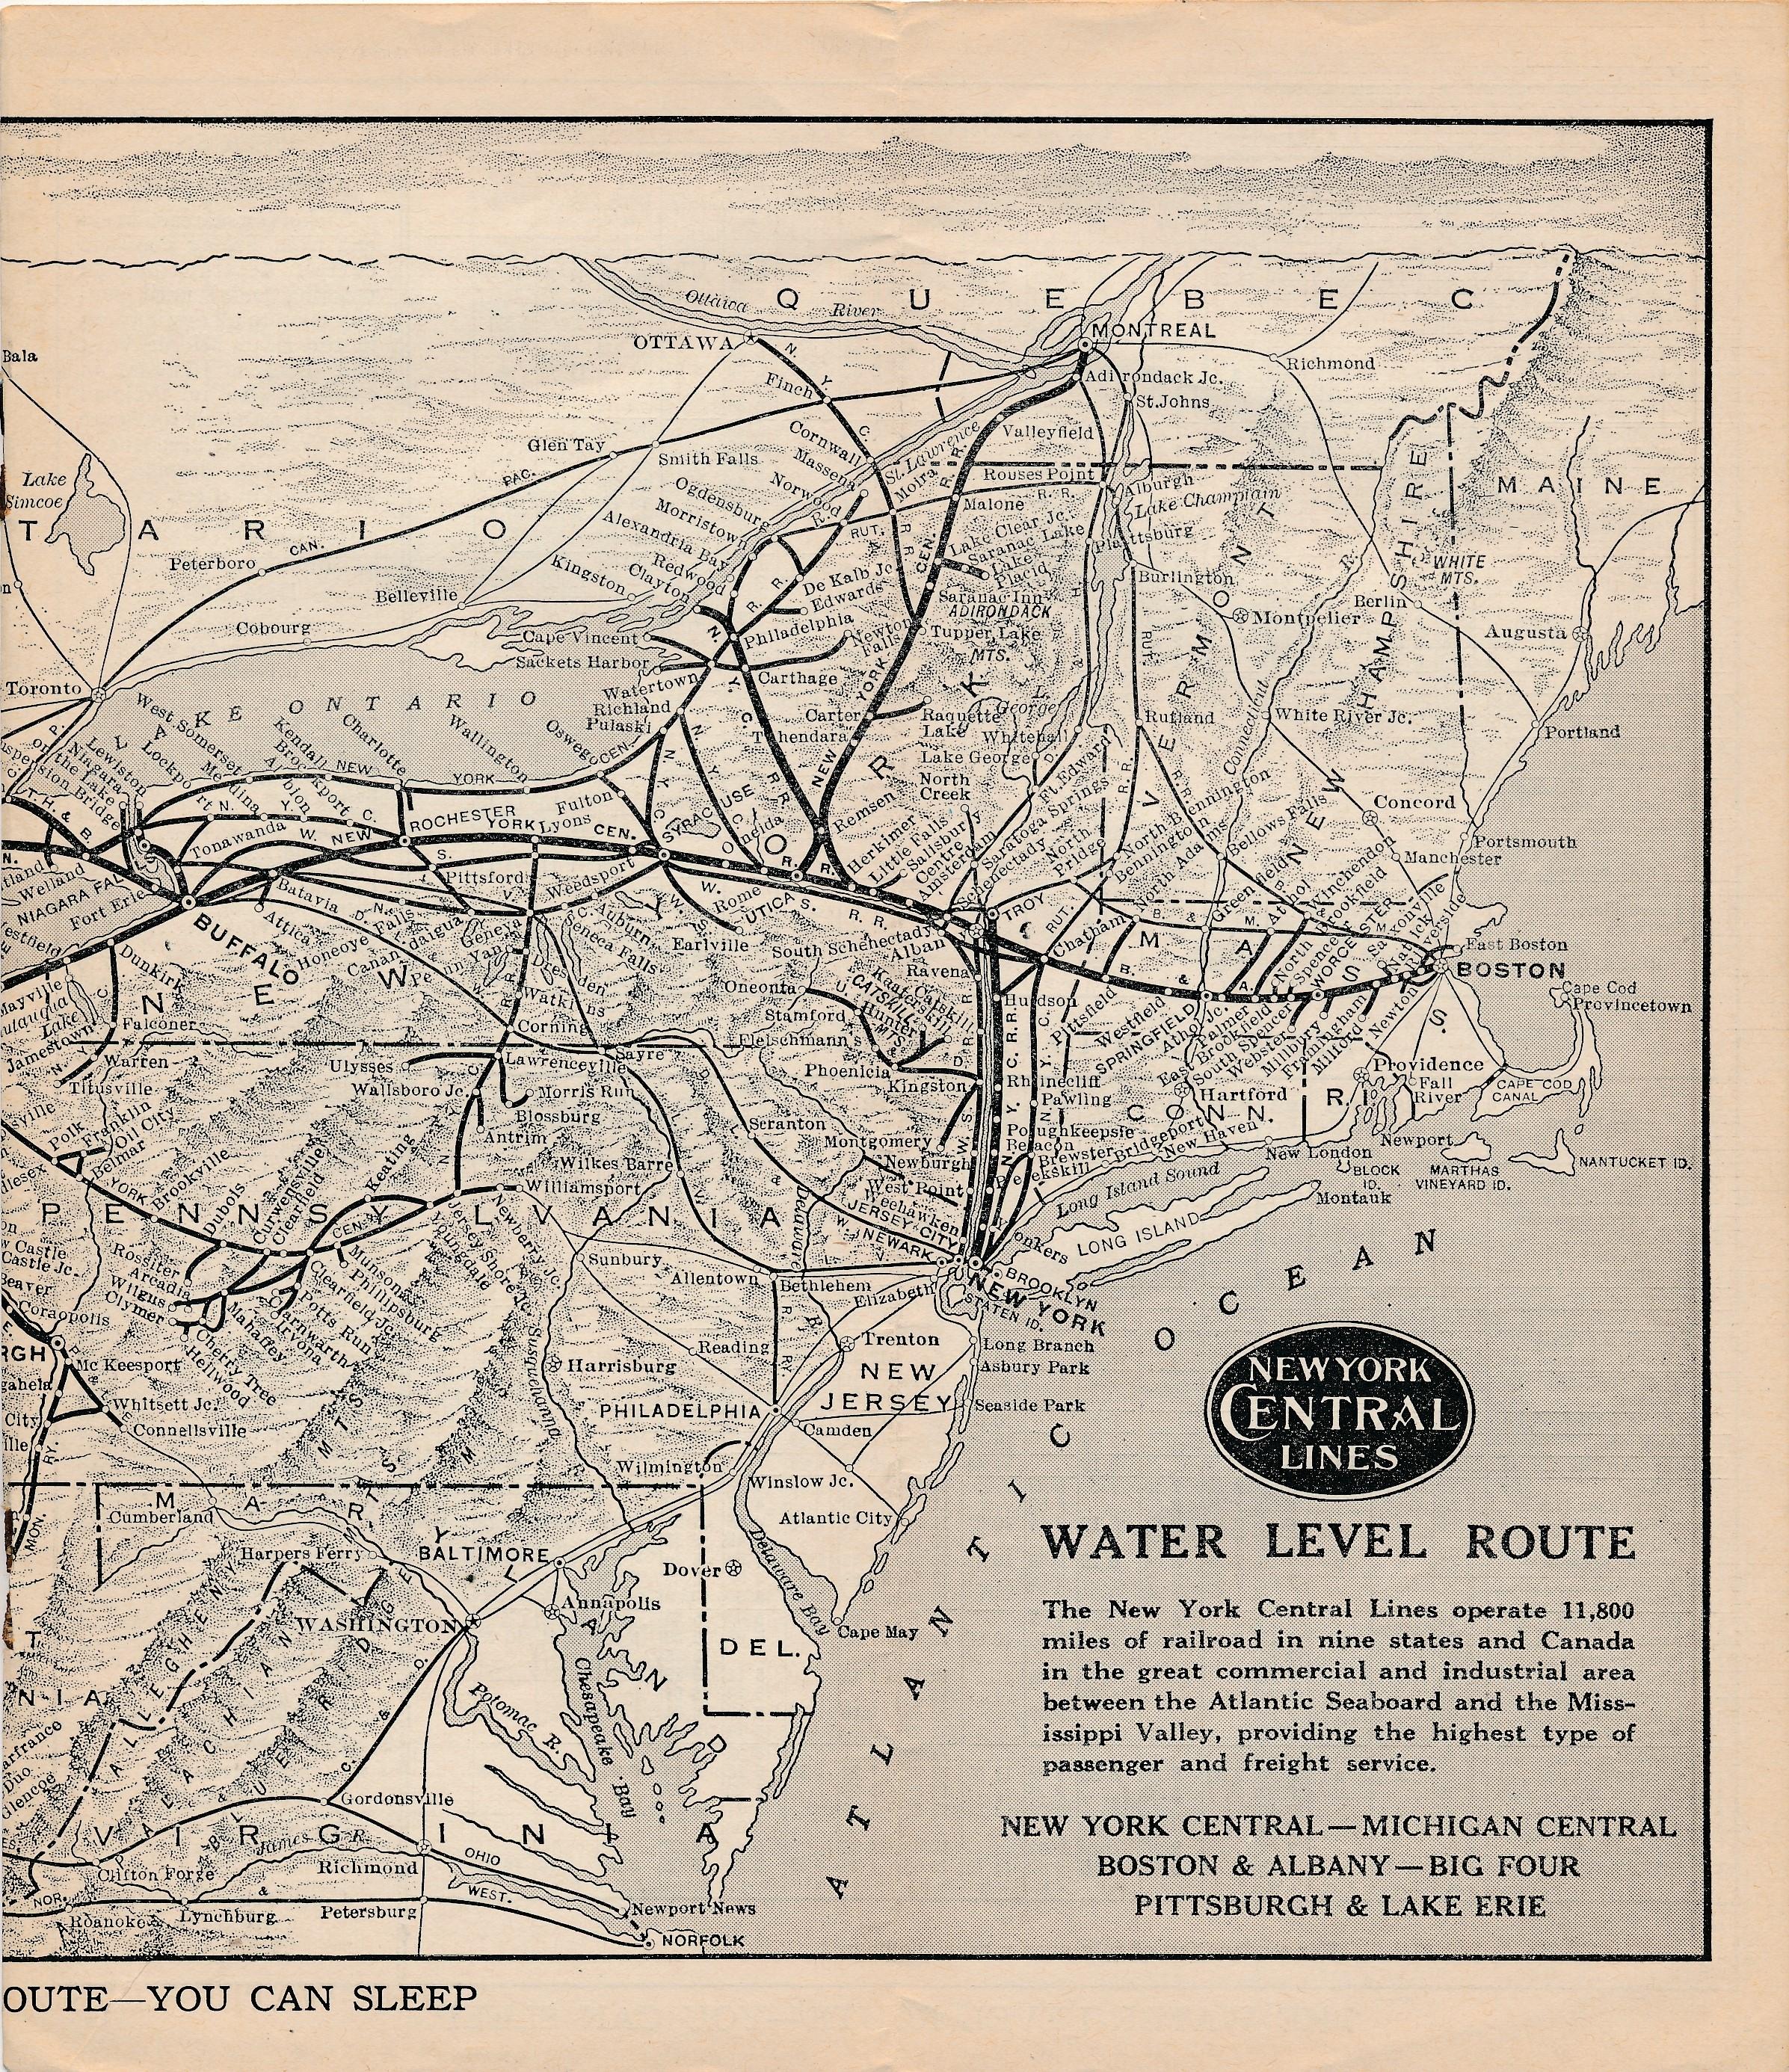 1933 P&LE Passenger Timetable (8).jpg